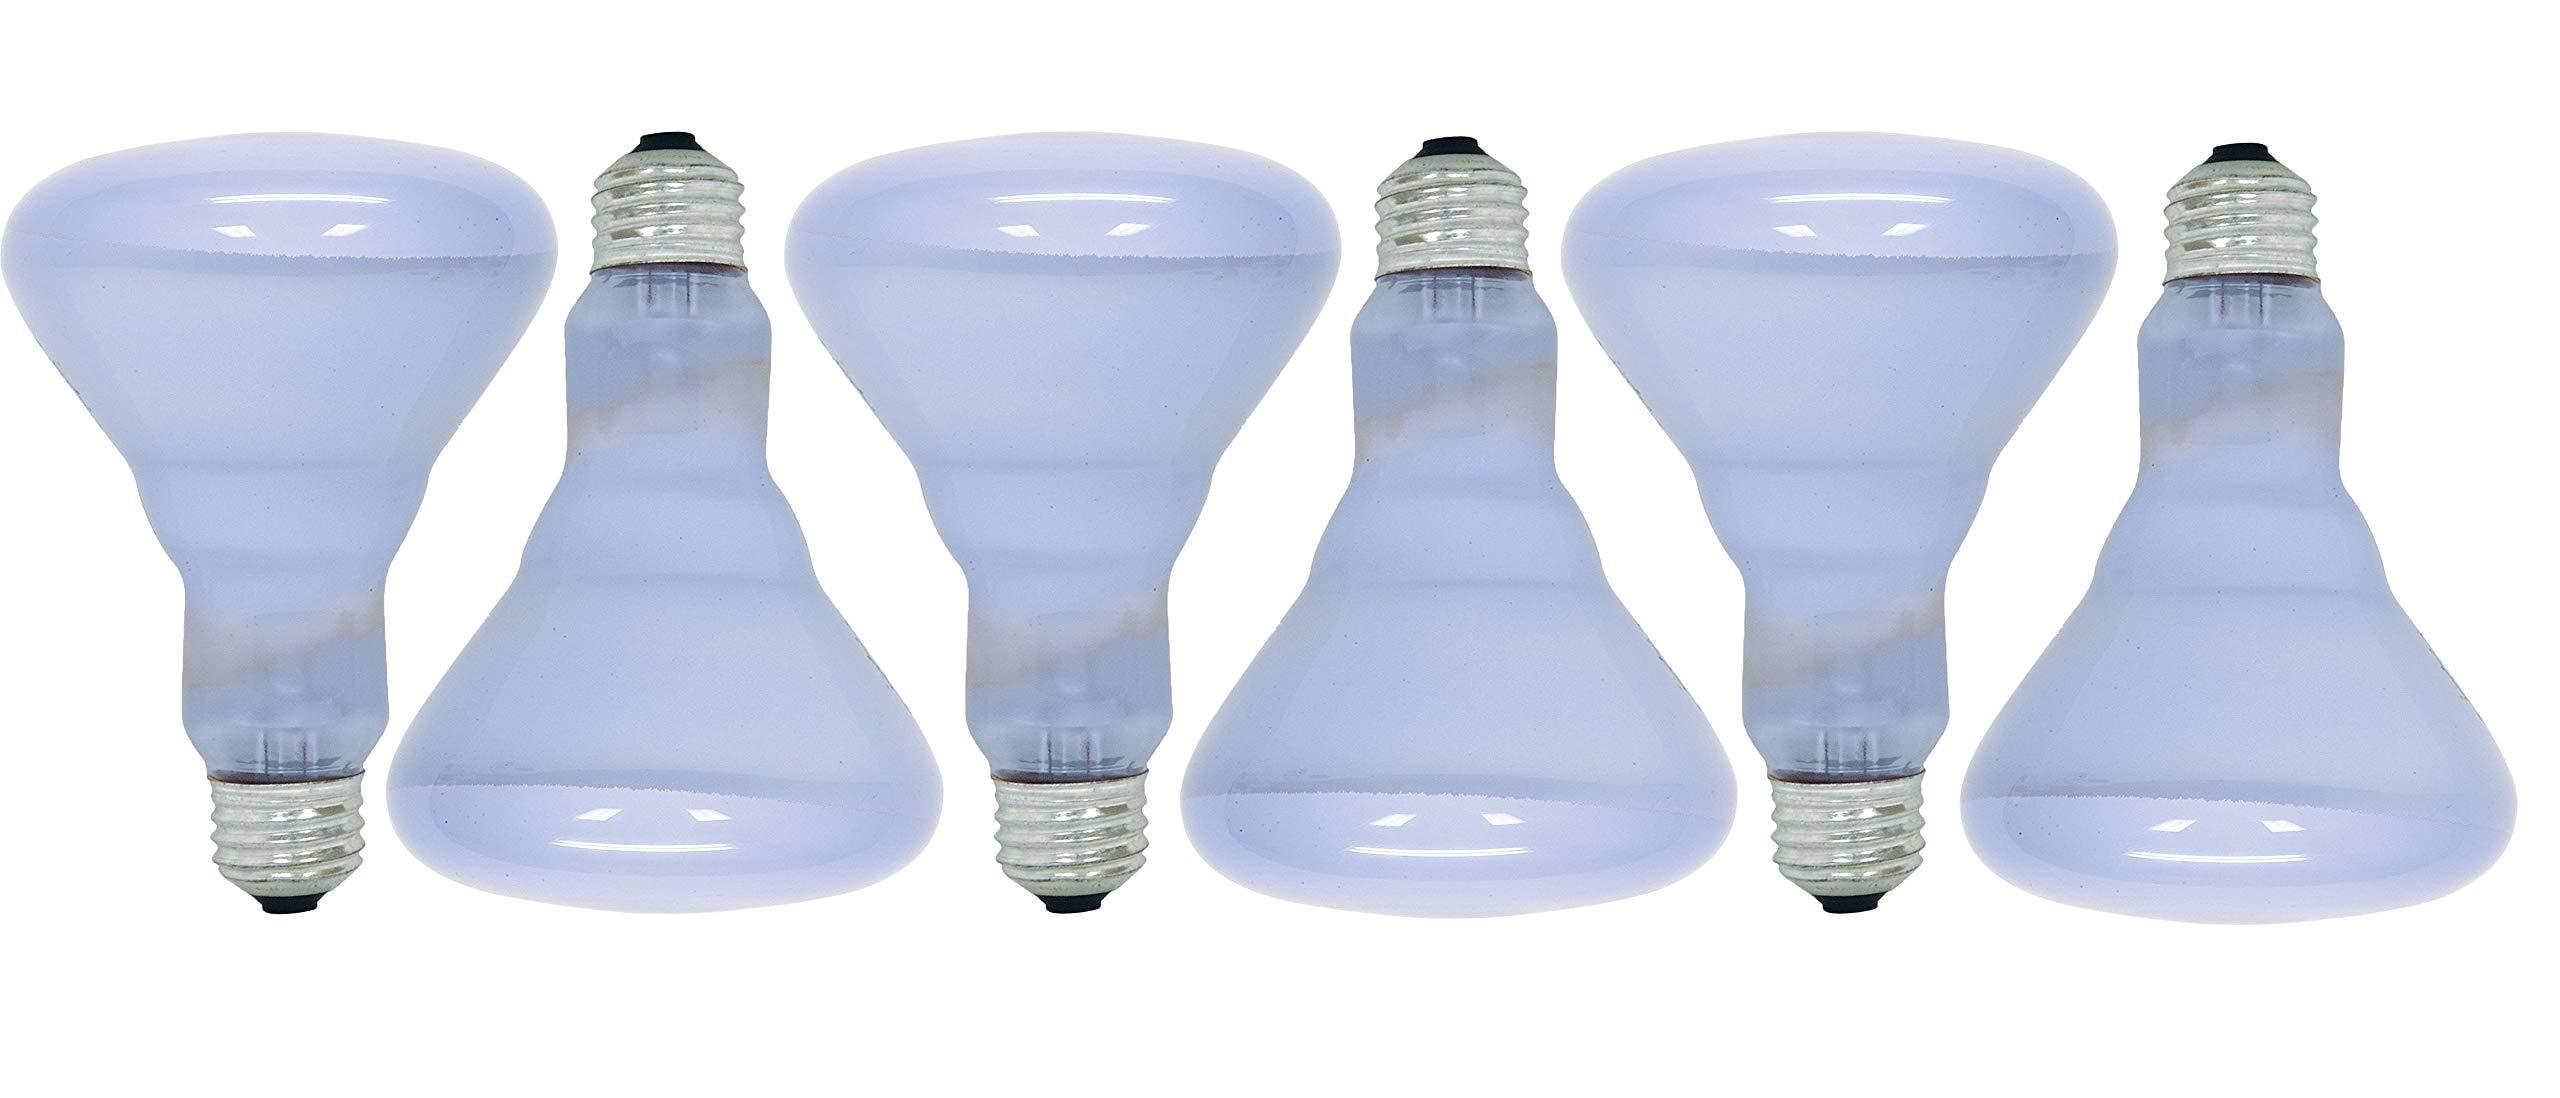 GE Lighting Reveal 65-watt 445-Lumen BR30 Flood Light Bulbs (6 Bulbs)